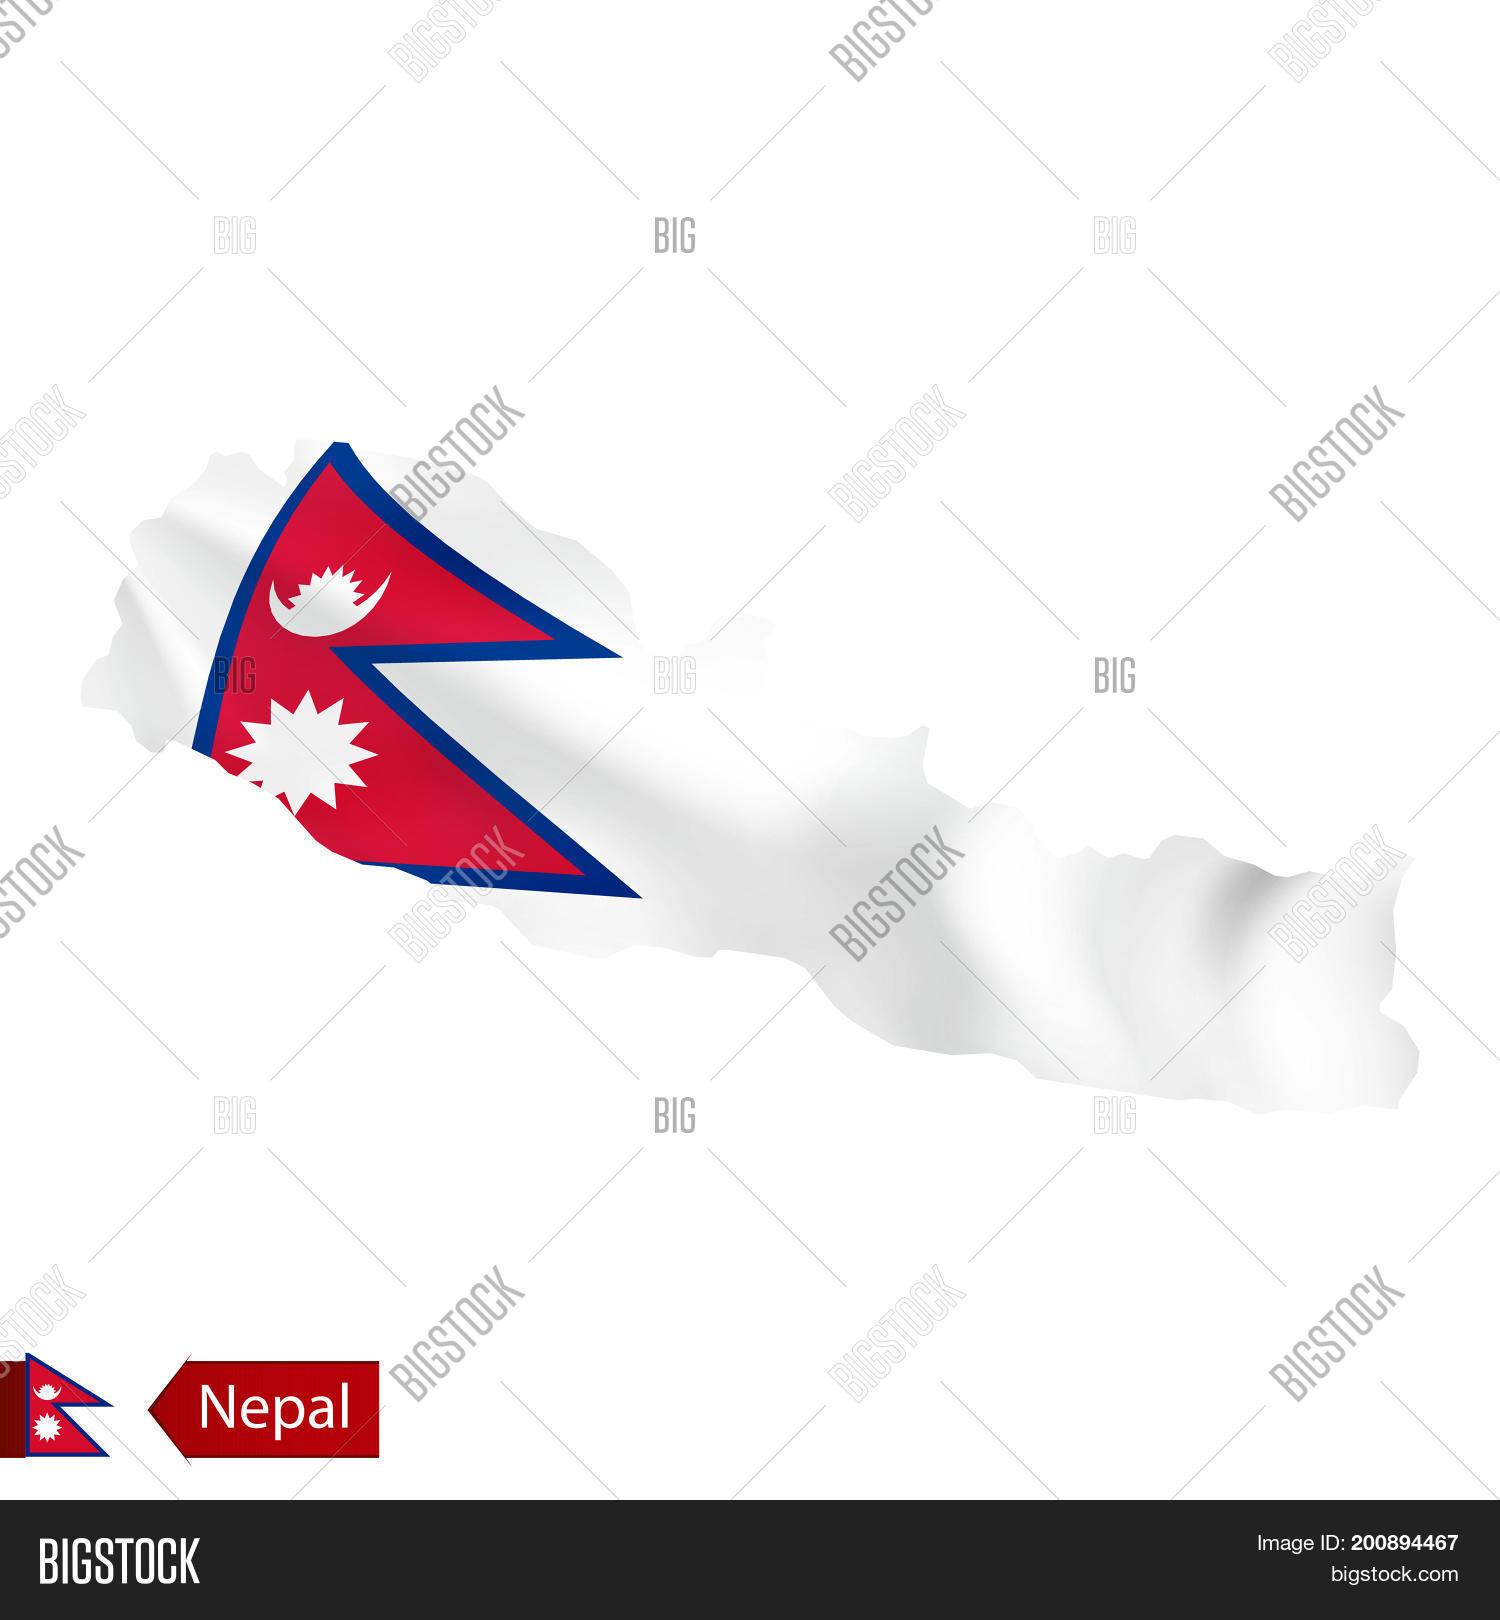 Nepal Map Waving Flag Vector & Photo (Free Trial) | Bigstock